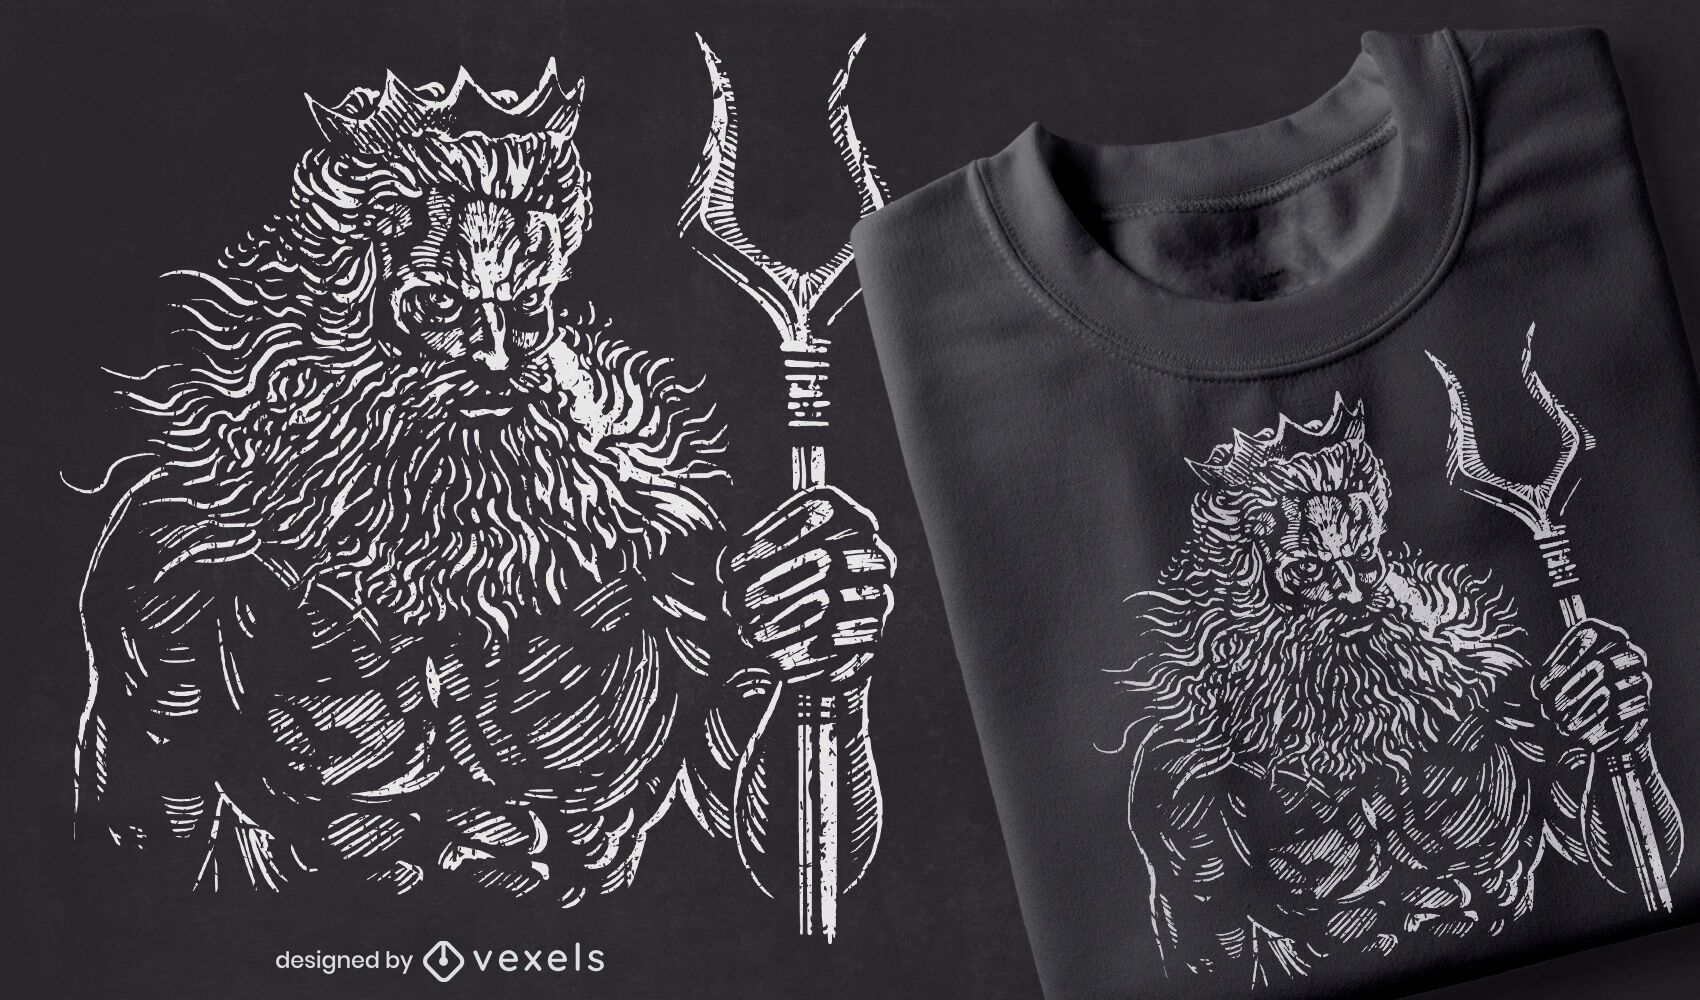 Diseño de camiseta dibujada a mano de Hades.